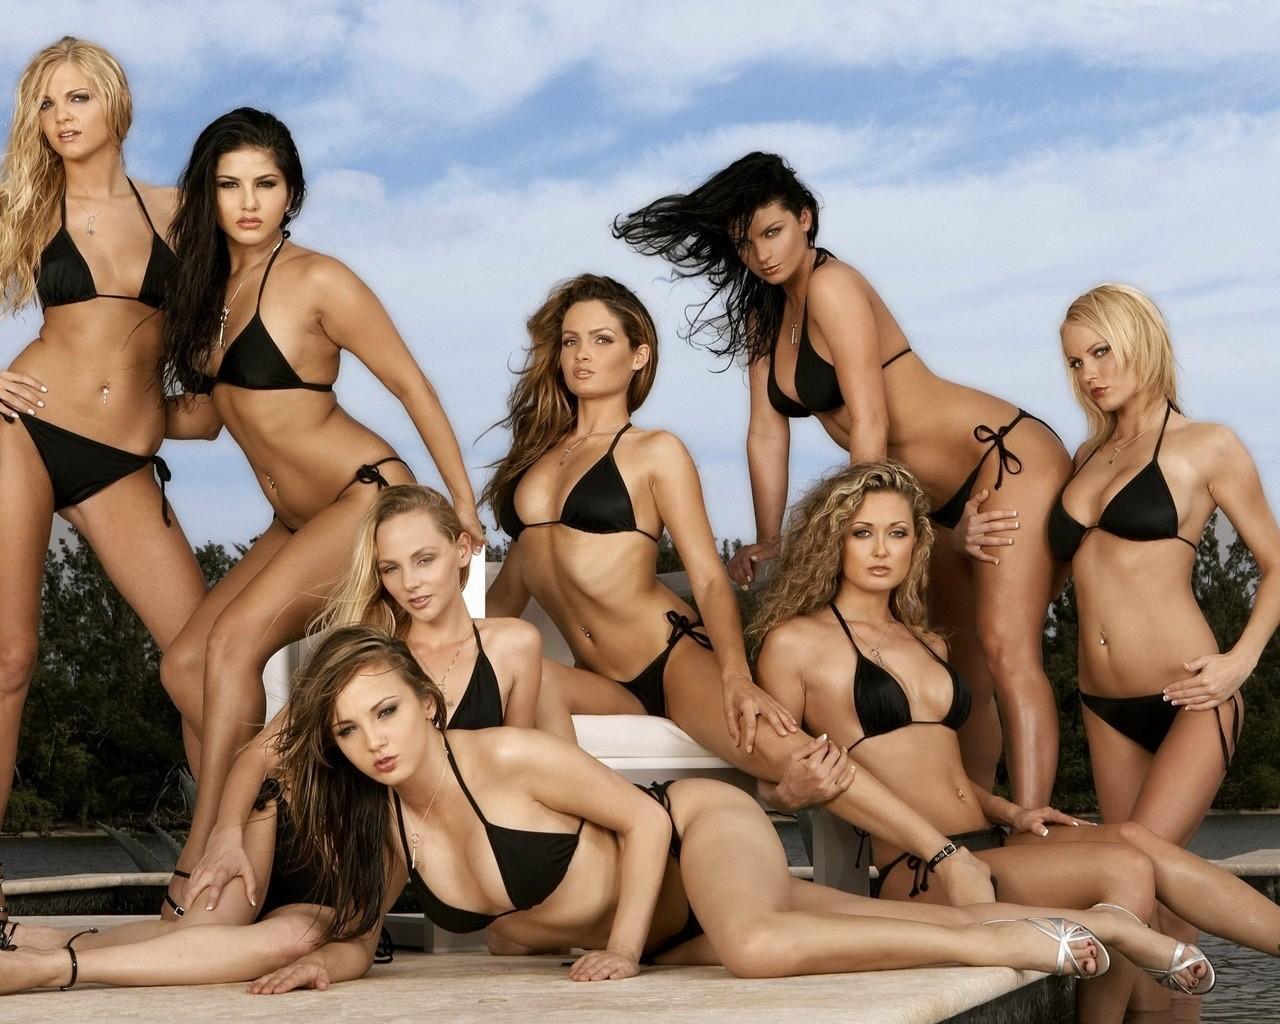 Hot sex group